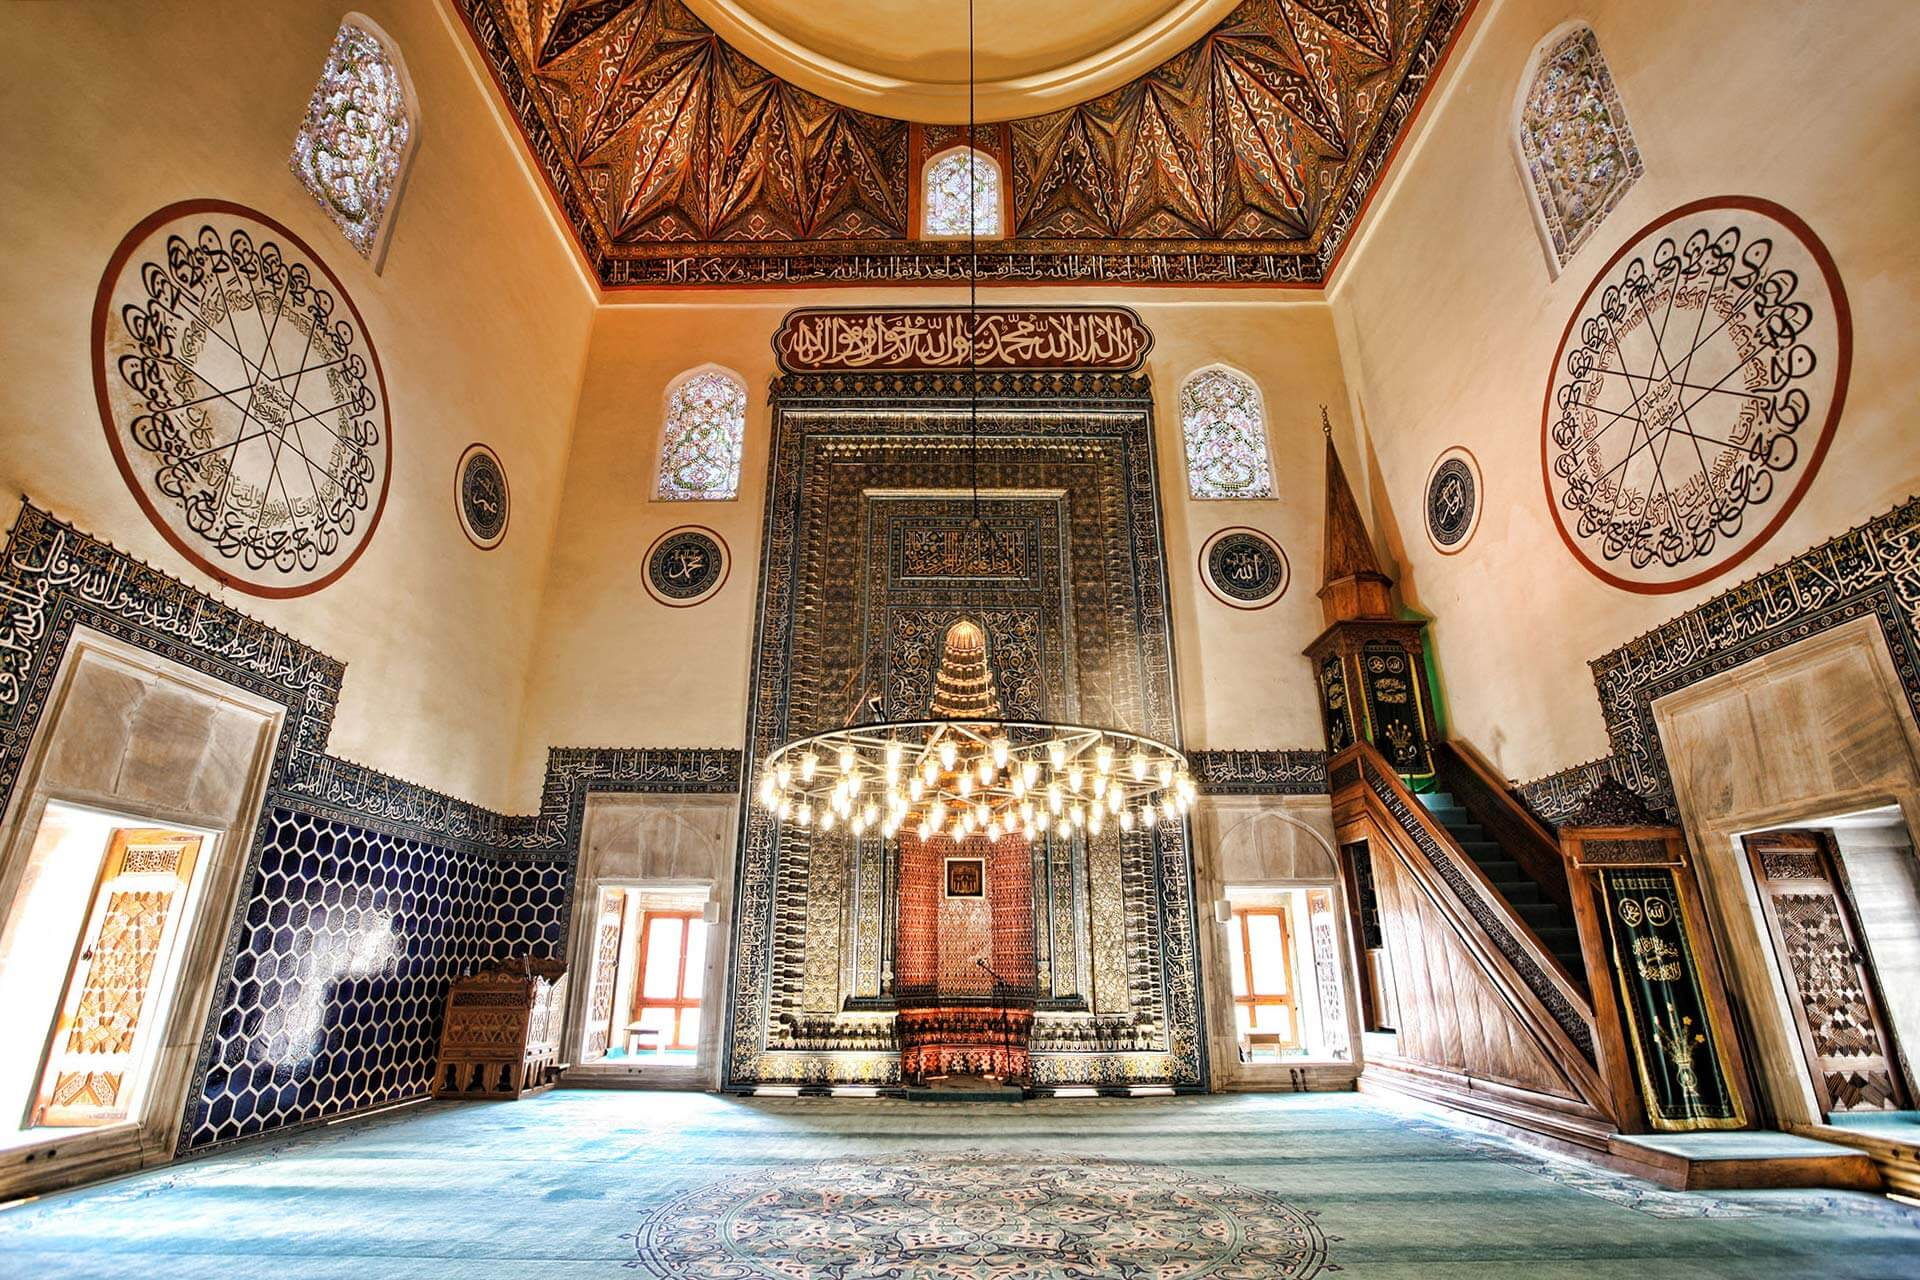 Bursa Yeşil Cami İç Mimarisi